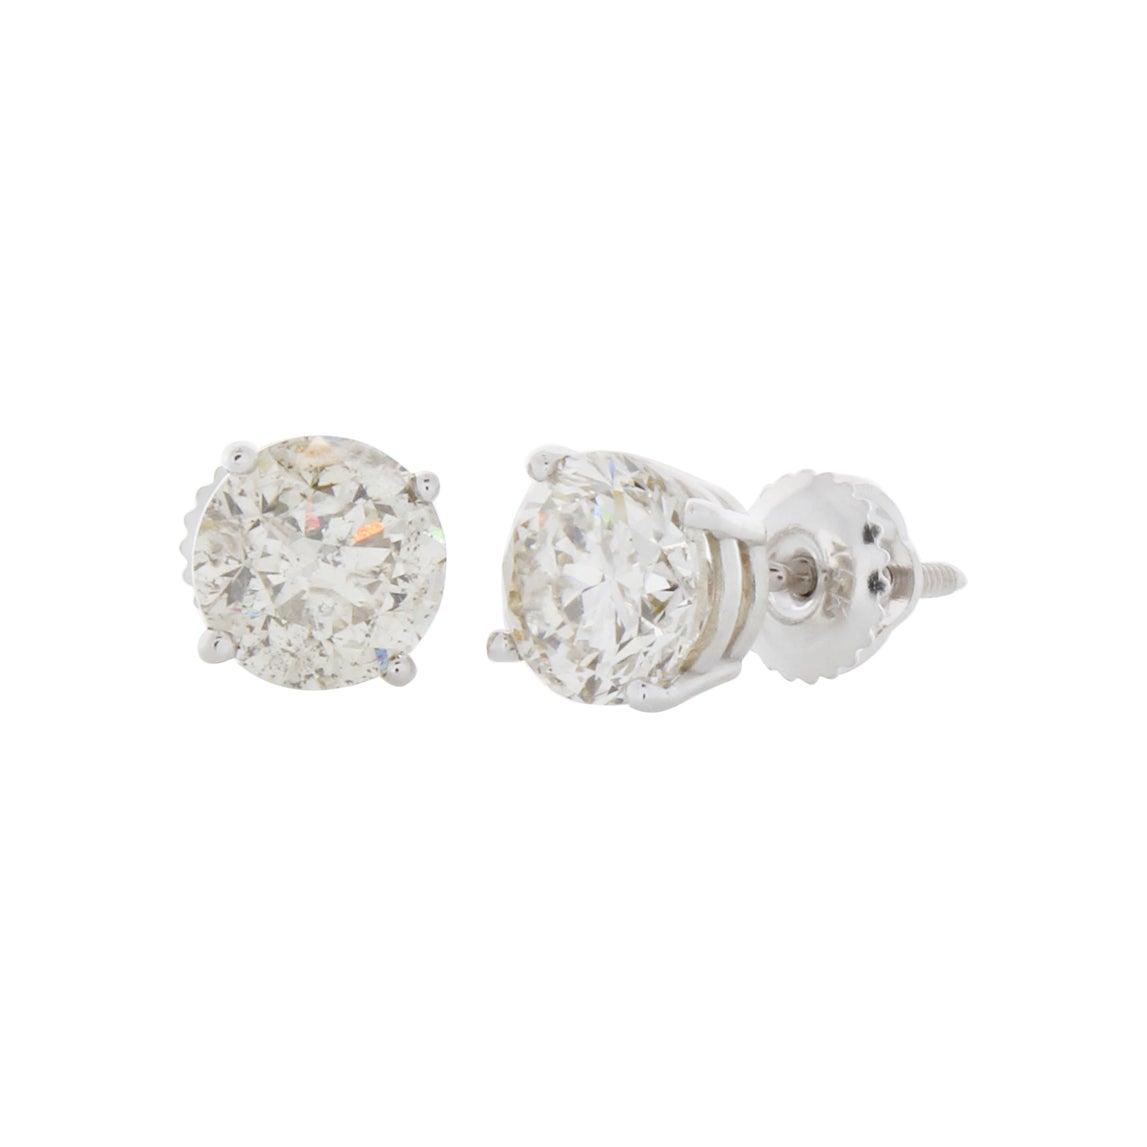 3 Carat Total Diamond Stud Earrings in 14k White Gold